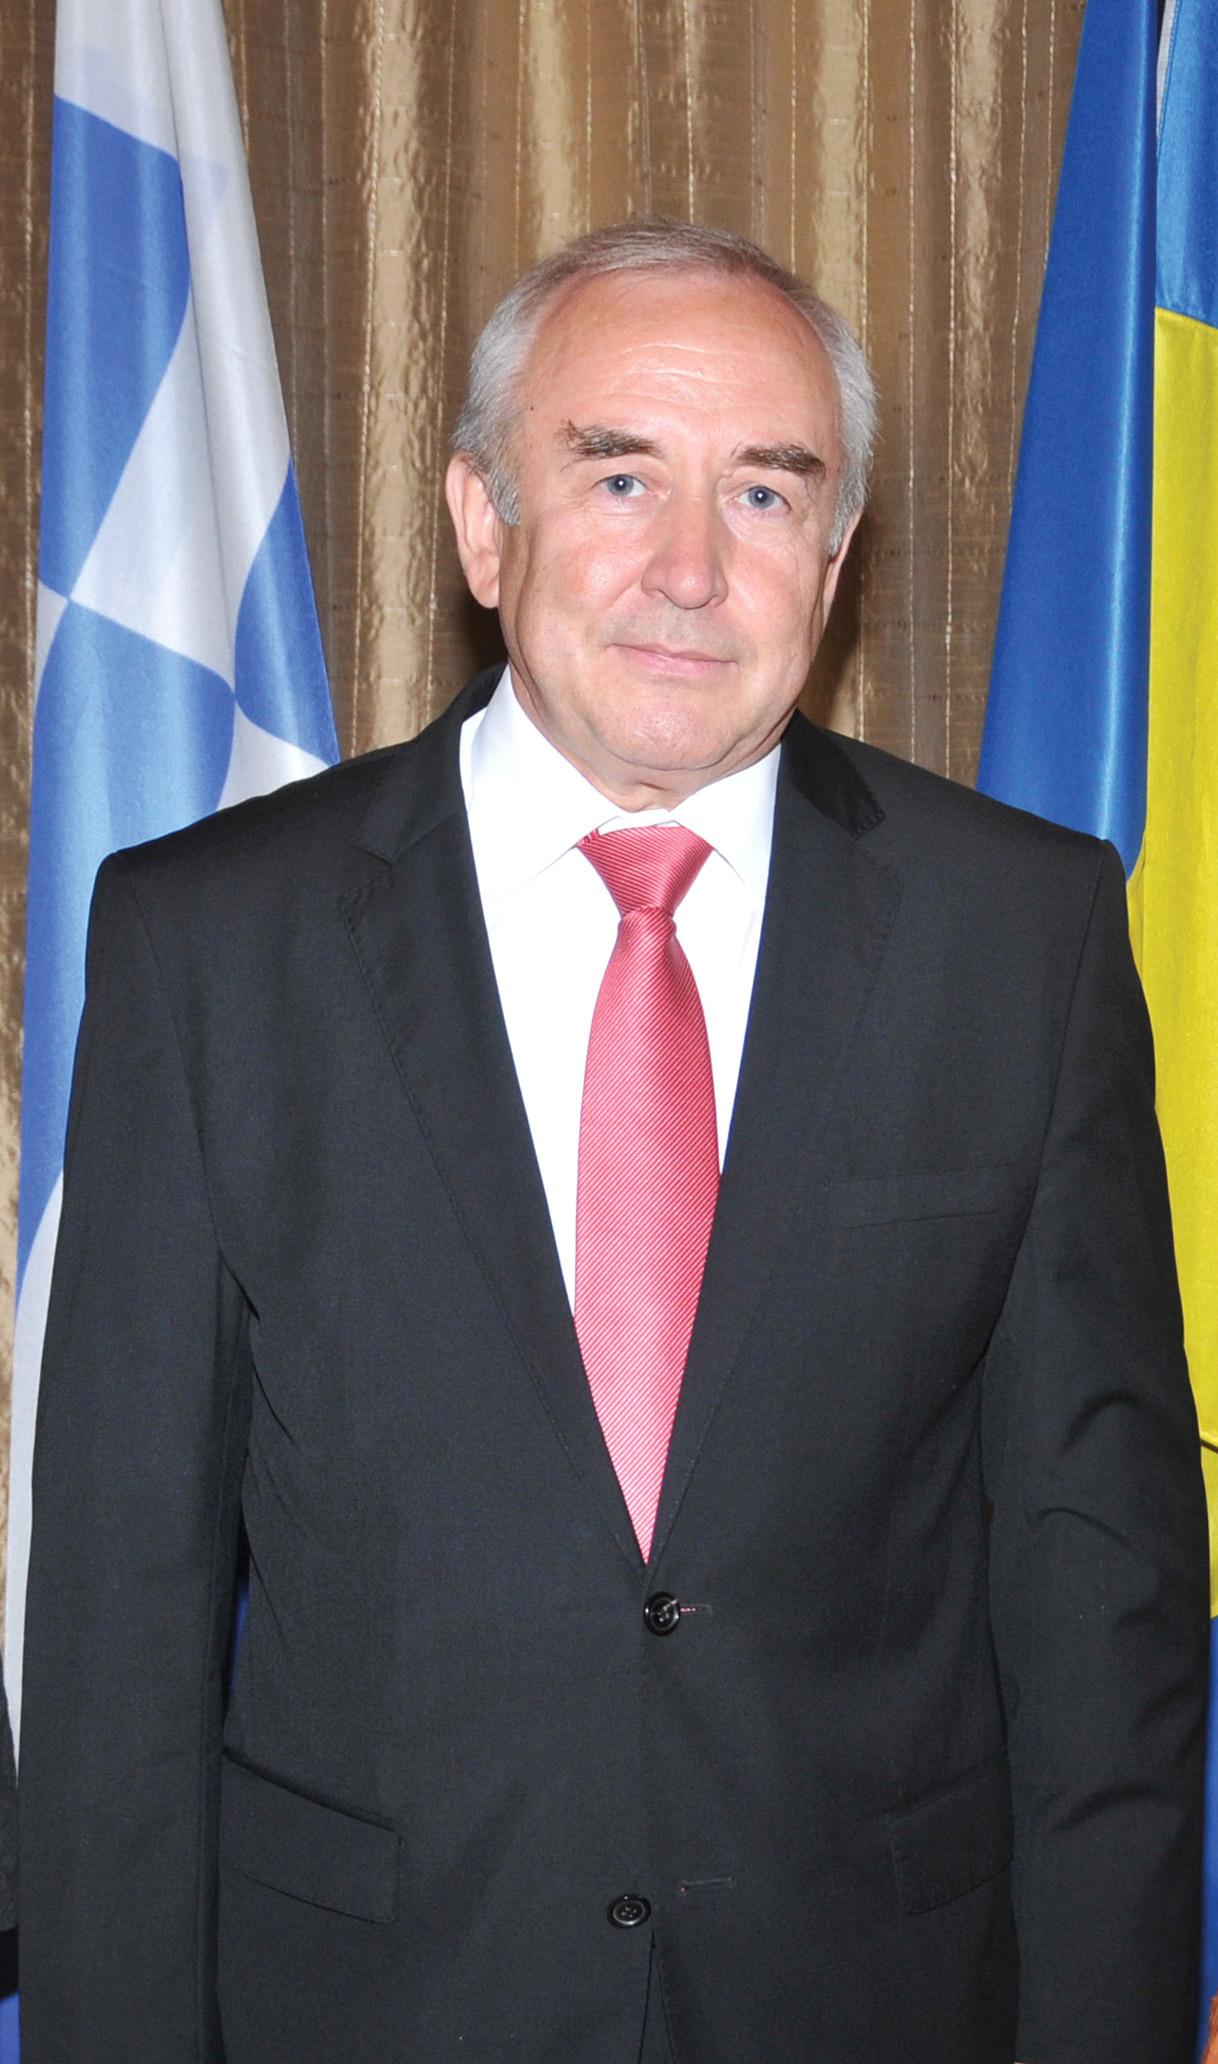 H.E. the Ambassador of Ukraine to the Hellenic Republic, Volodymyr Shkurov